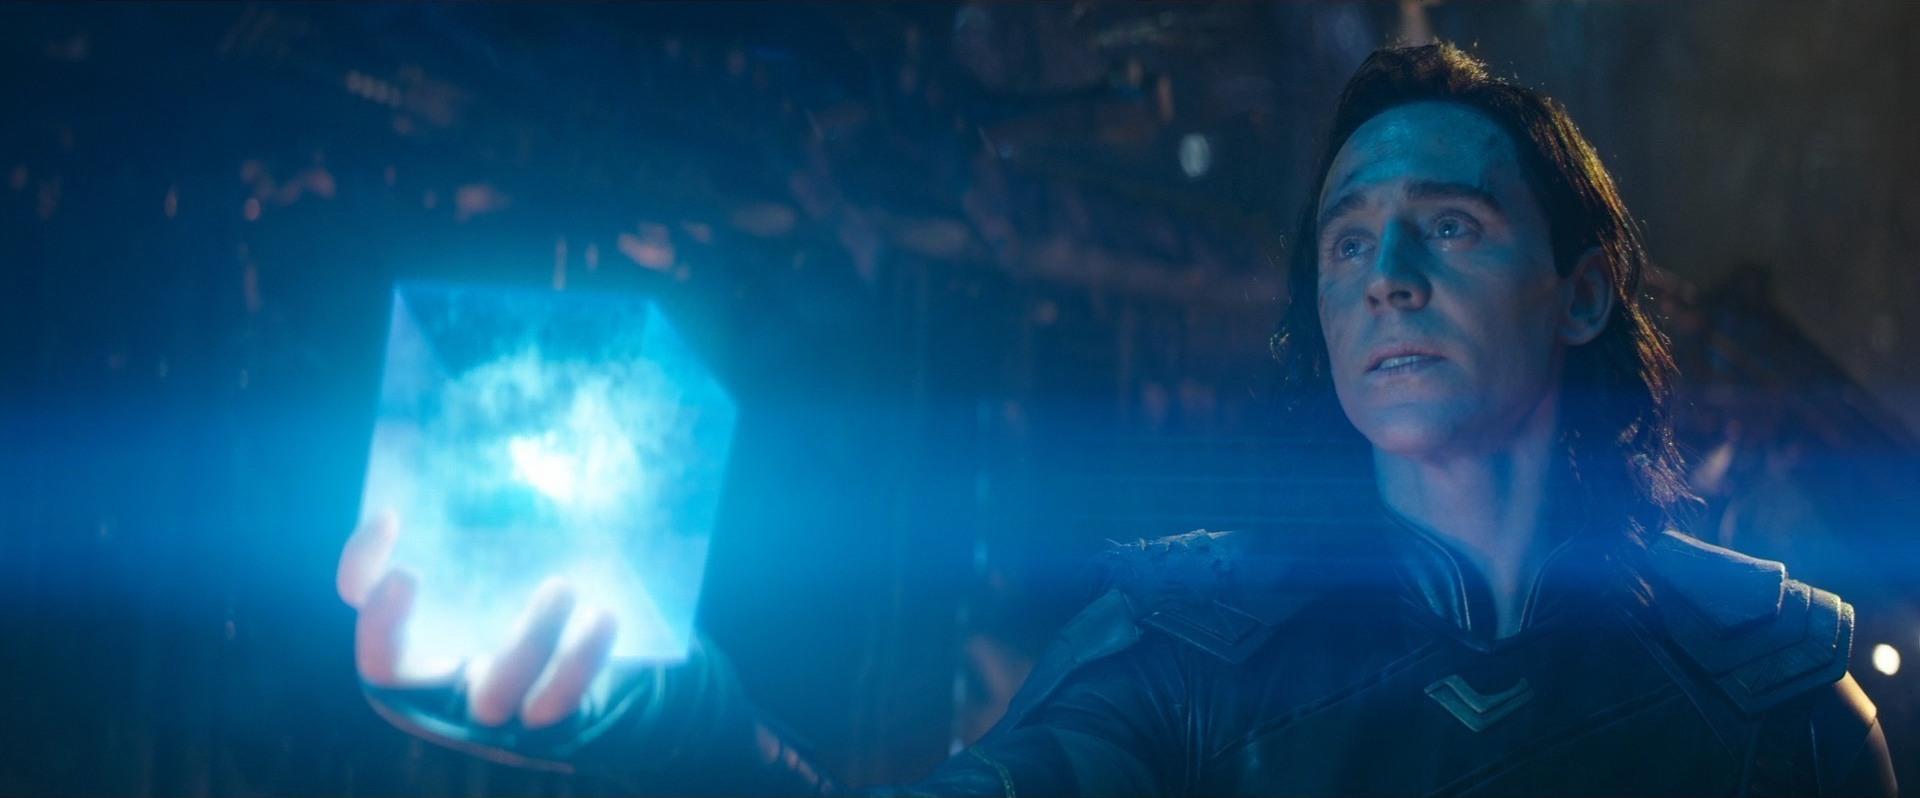 Loki (Tom Hiddleston) avec la Pierre de l'Espace dans le Tesseract, Avengers : Infinity War